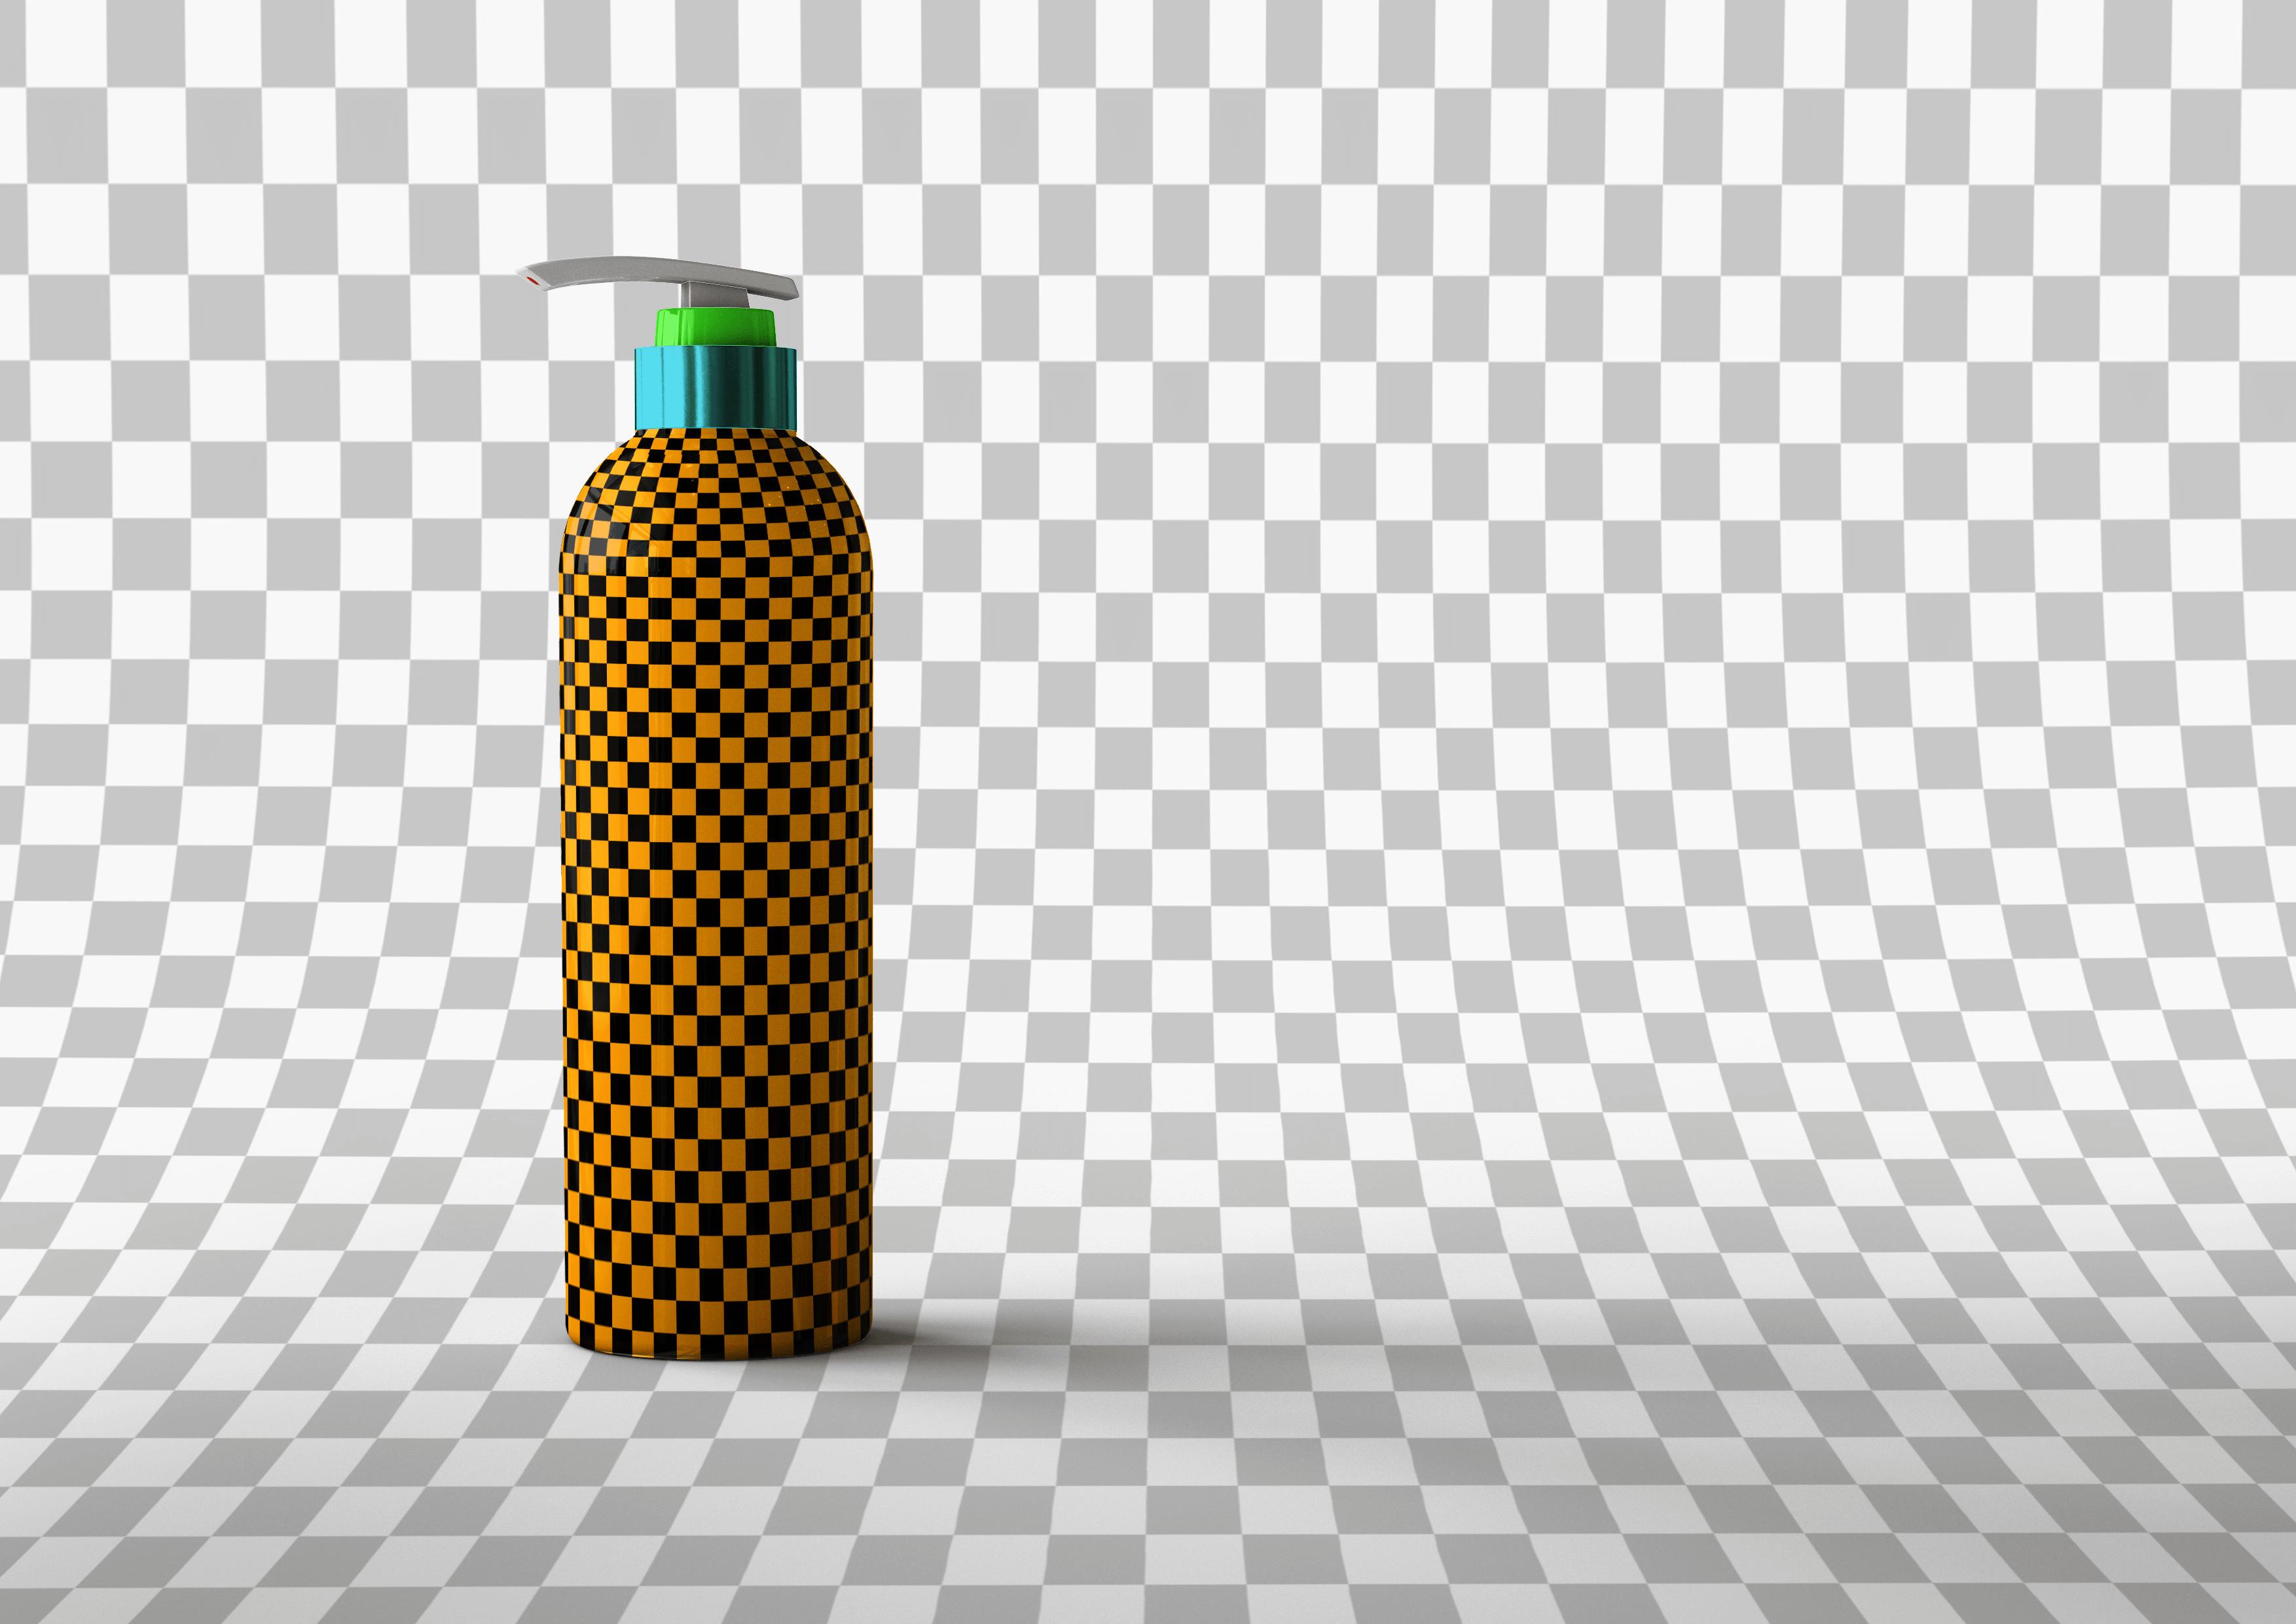 Мокап бутылки с дозатором. shampoo bottle mockup